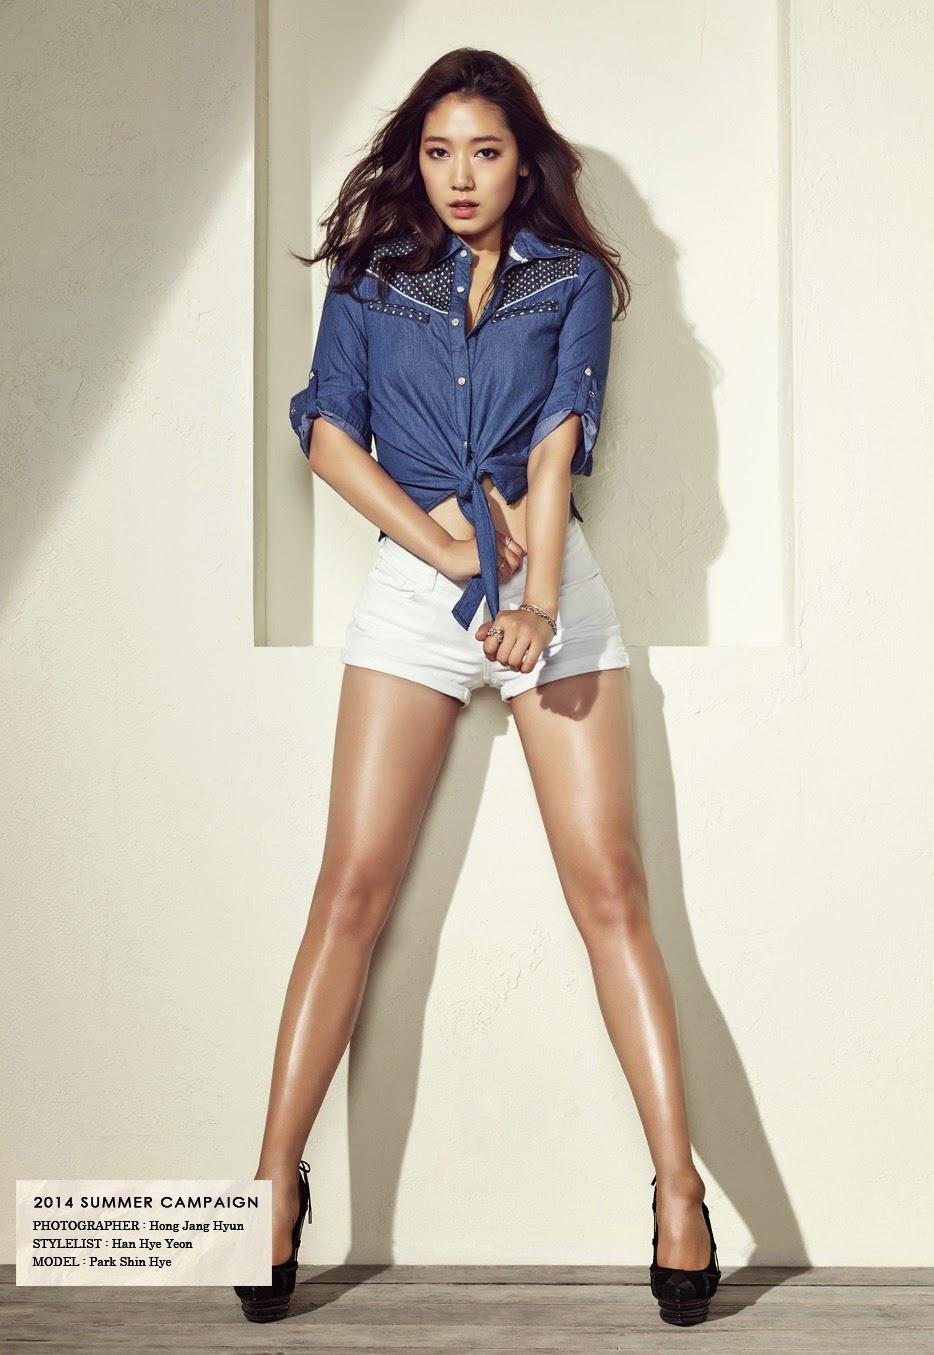 Park Shin Hye - Jambangee Summer 2014